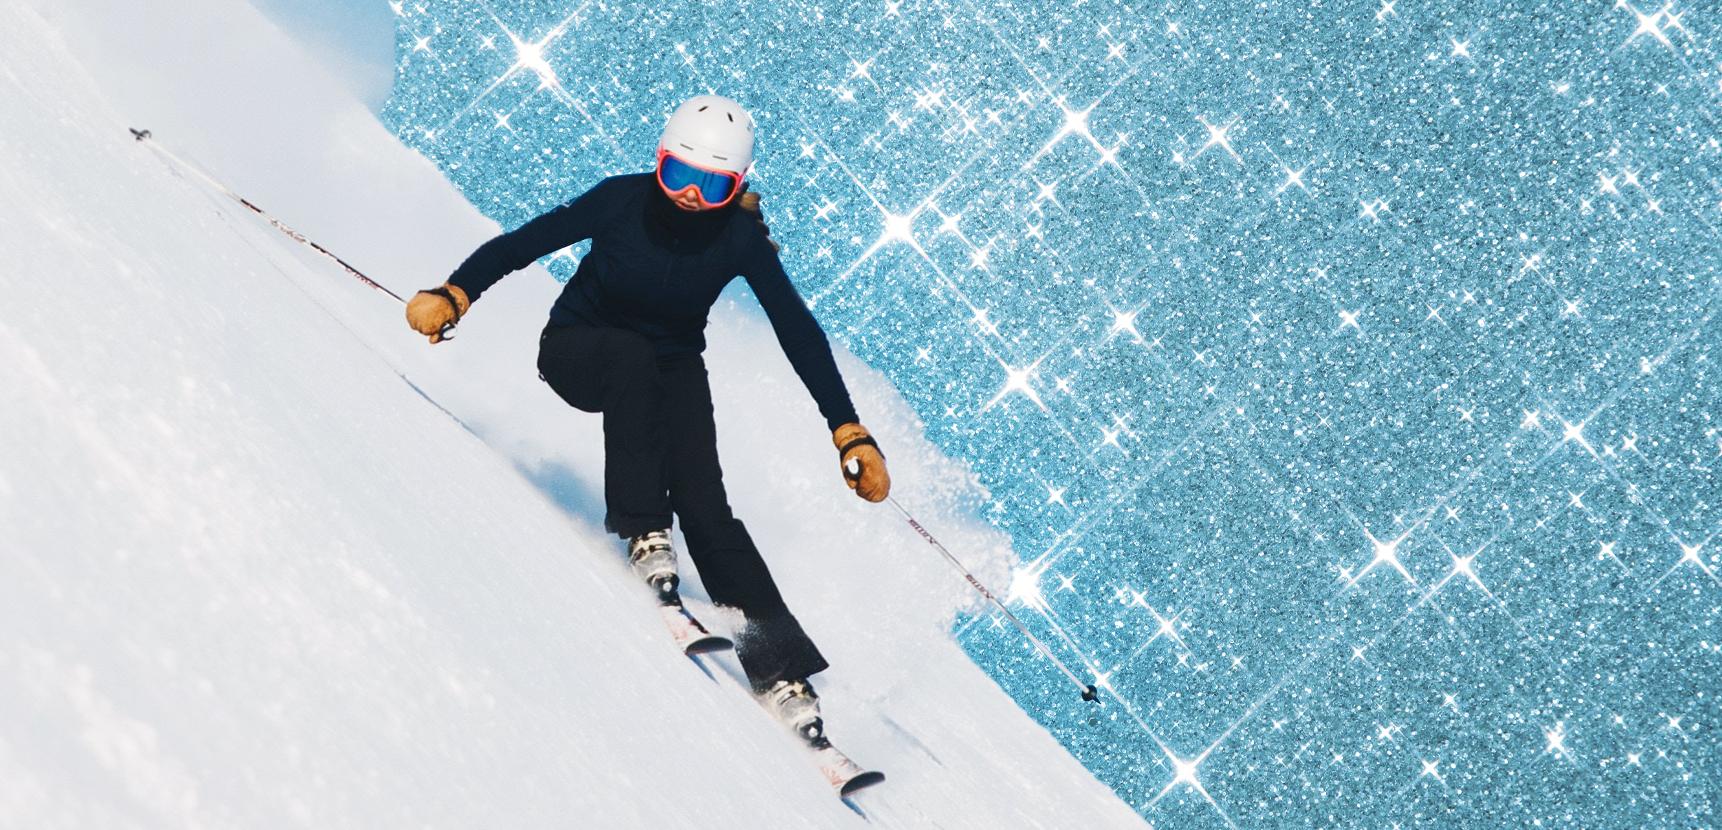 Sciare in Giappone, l'alternativa ideale a ogni settimana bianca banale